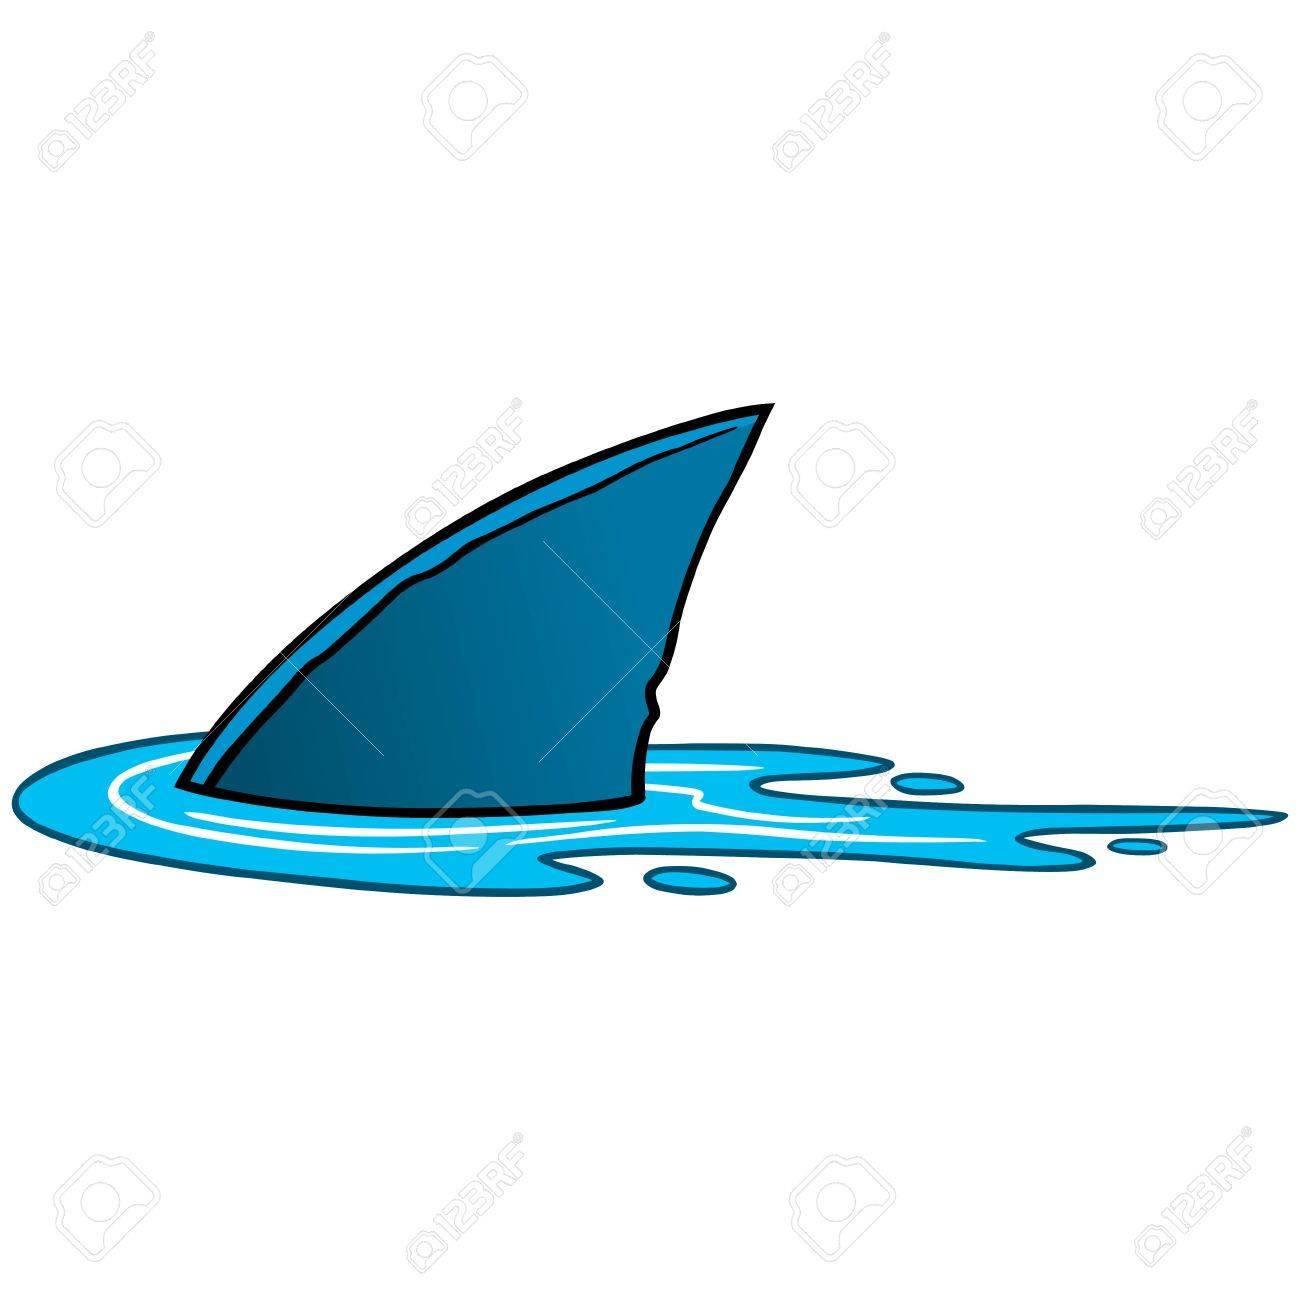 shark fin royalty free cliparts vectors and stock illustration rh 123rf com Shark Fin Clip Art Waves shark fin clip art free